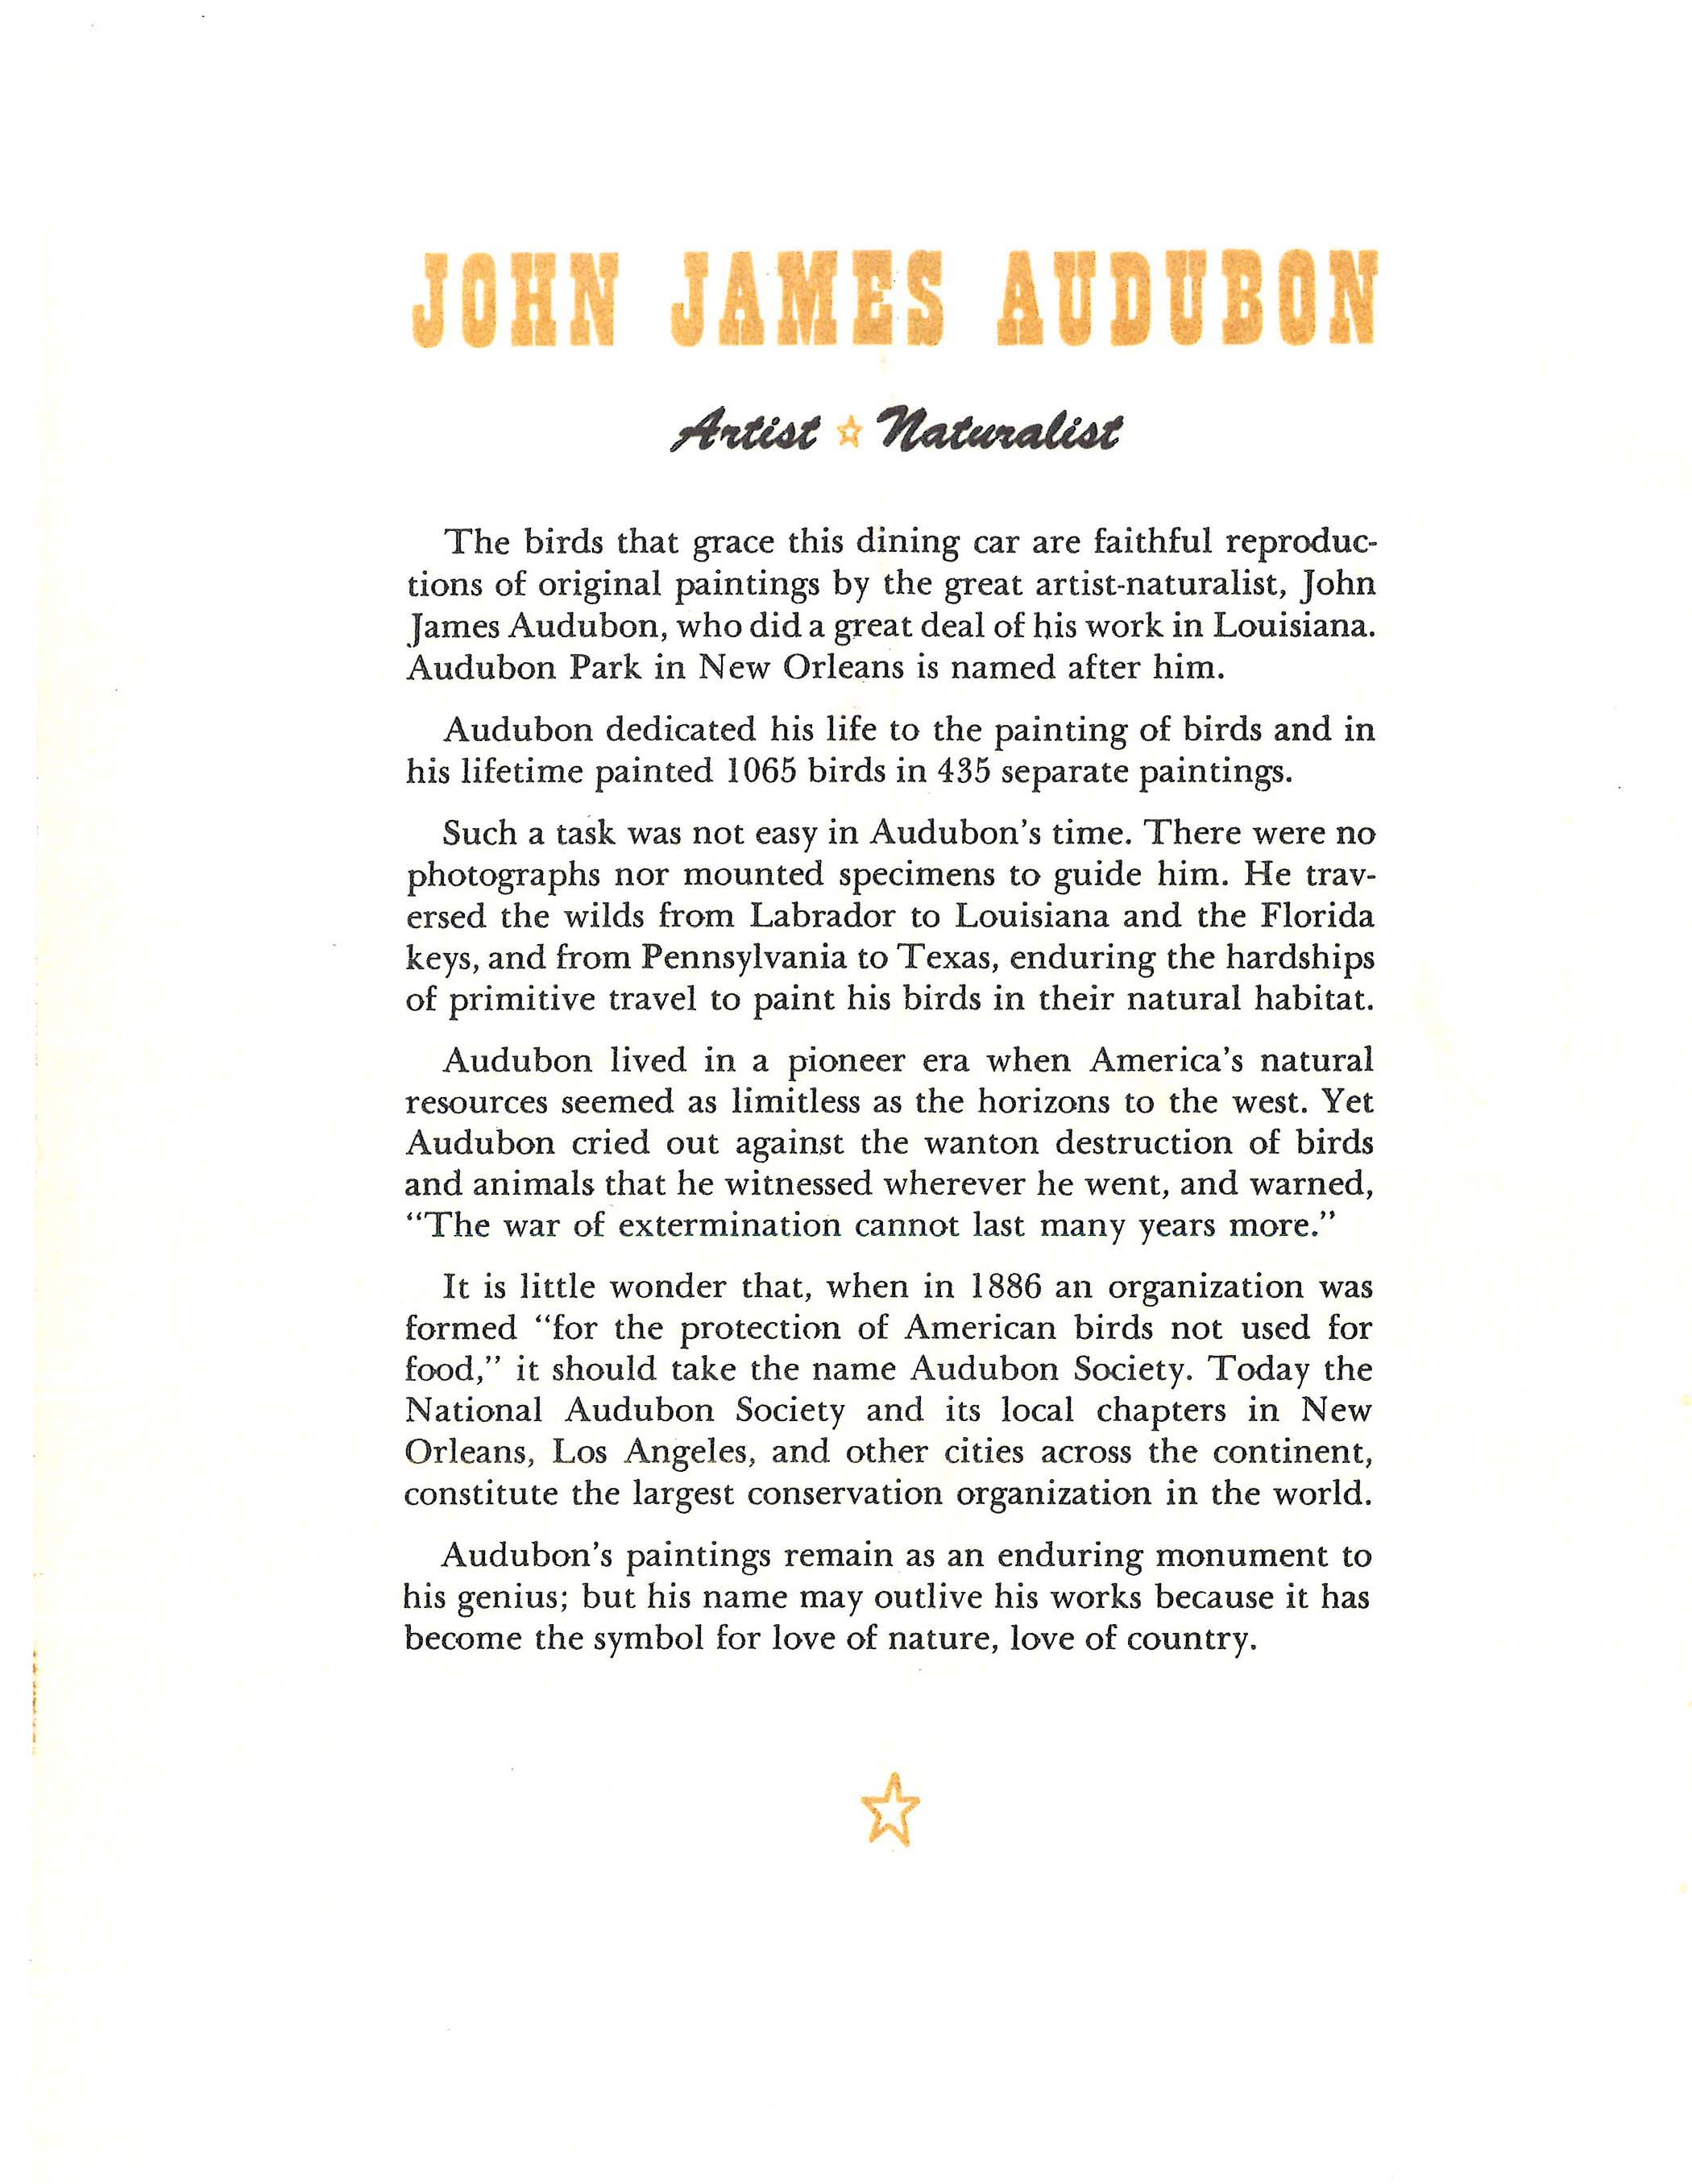 SP+John+James+Audubon+Dinner+Menu+3-65 3.jpg